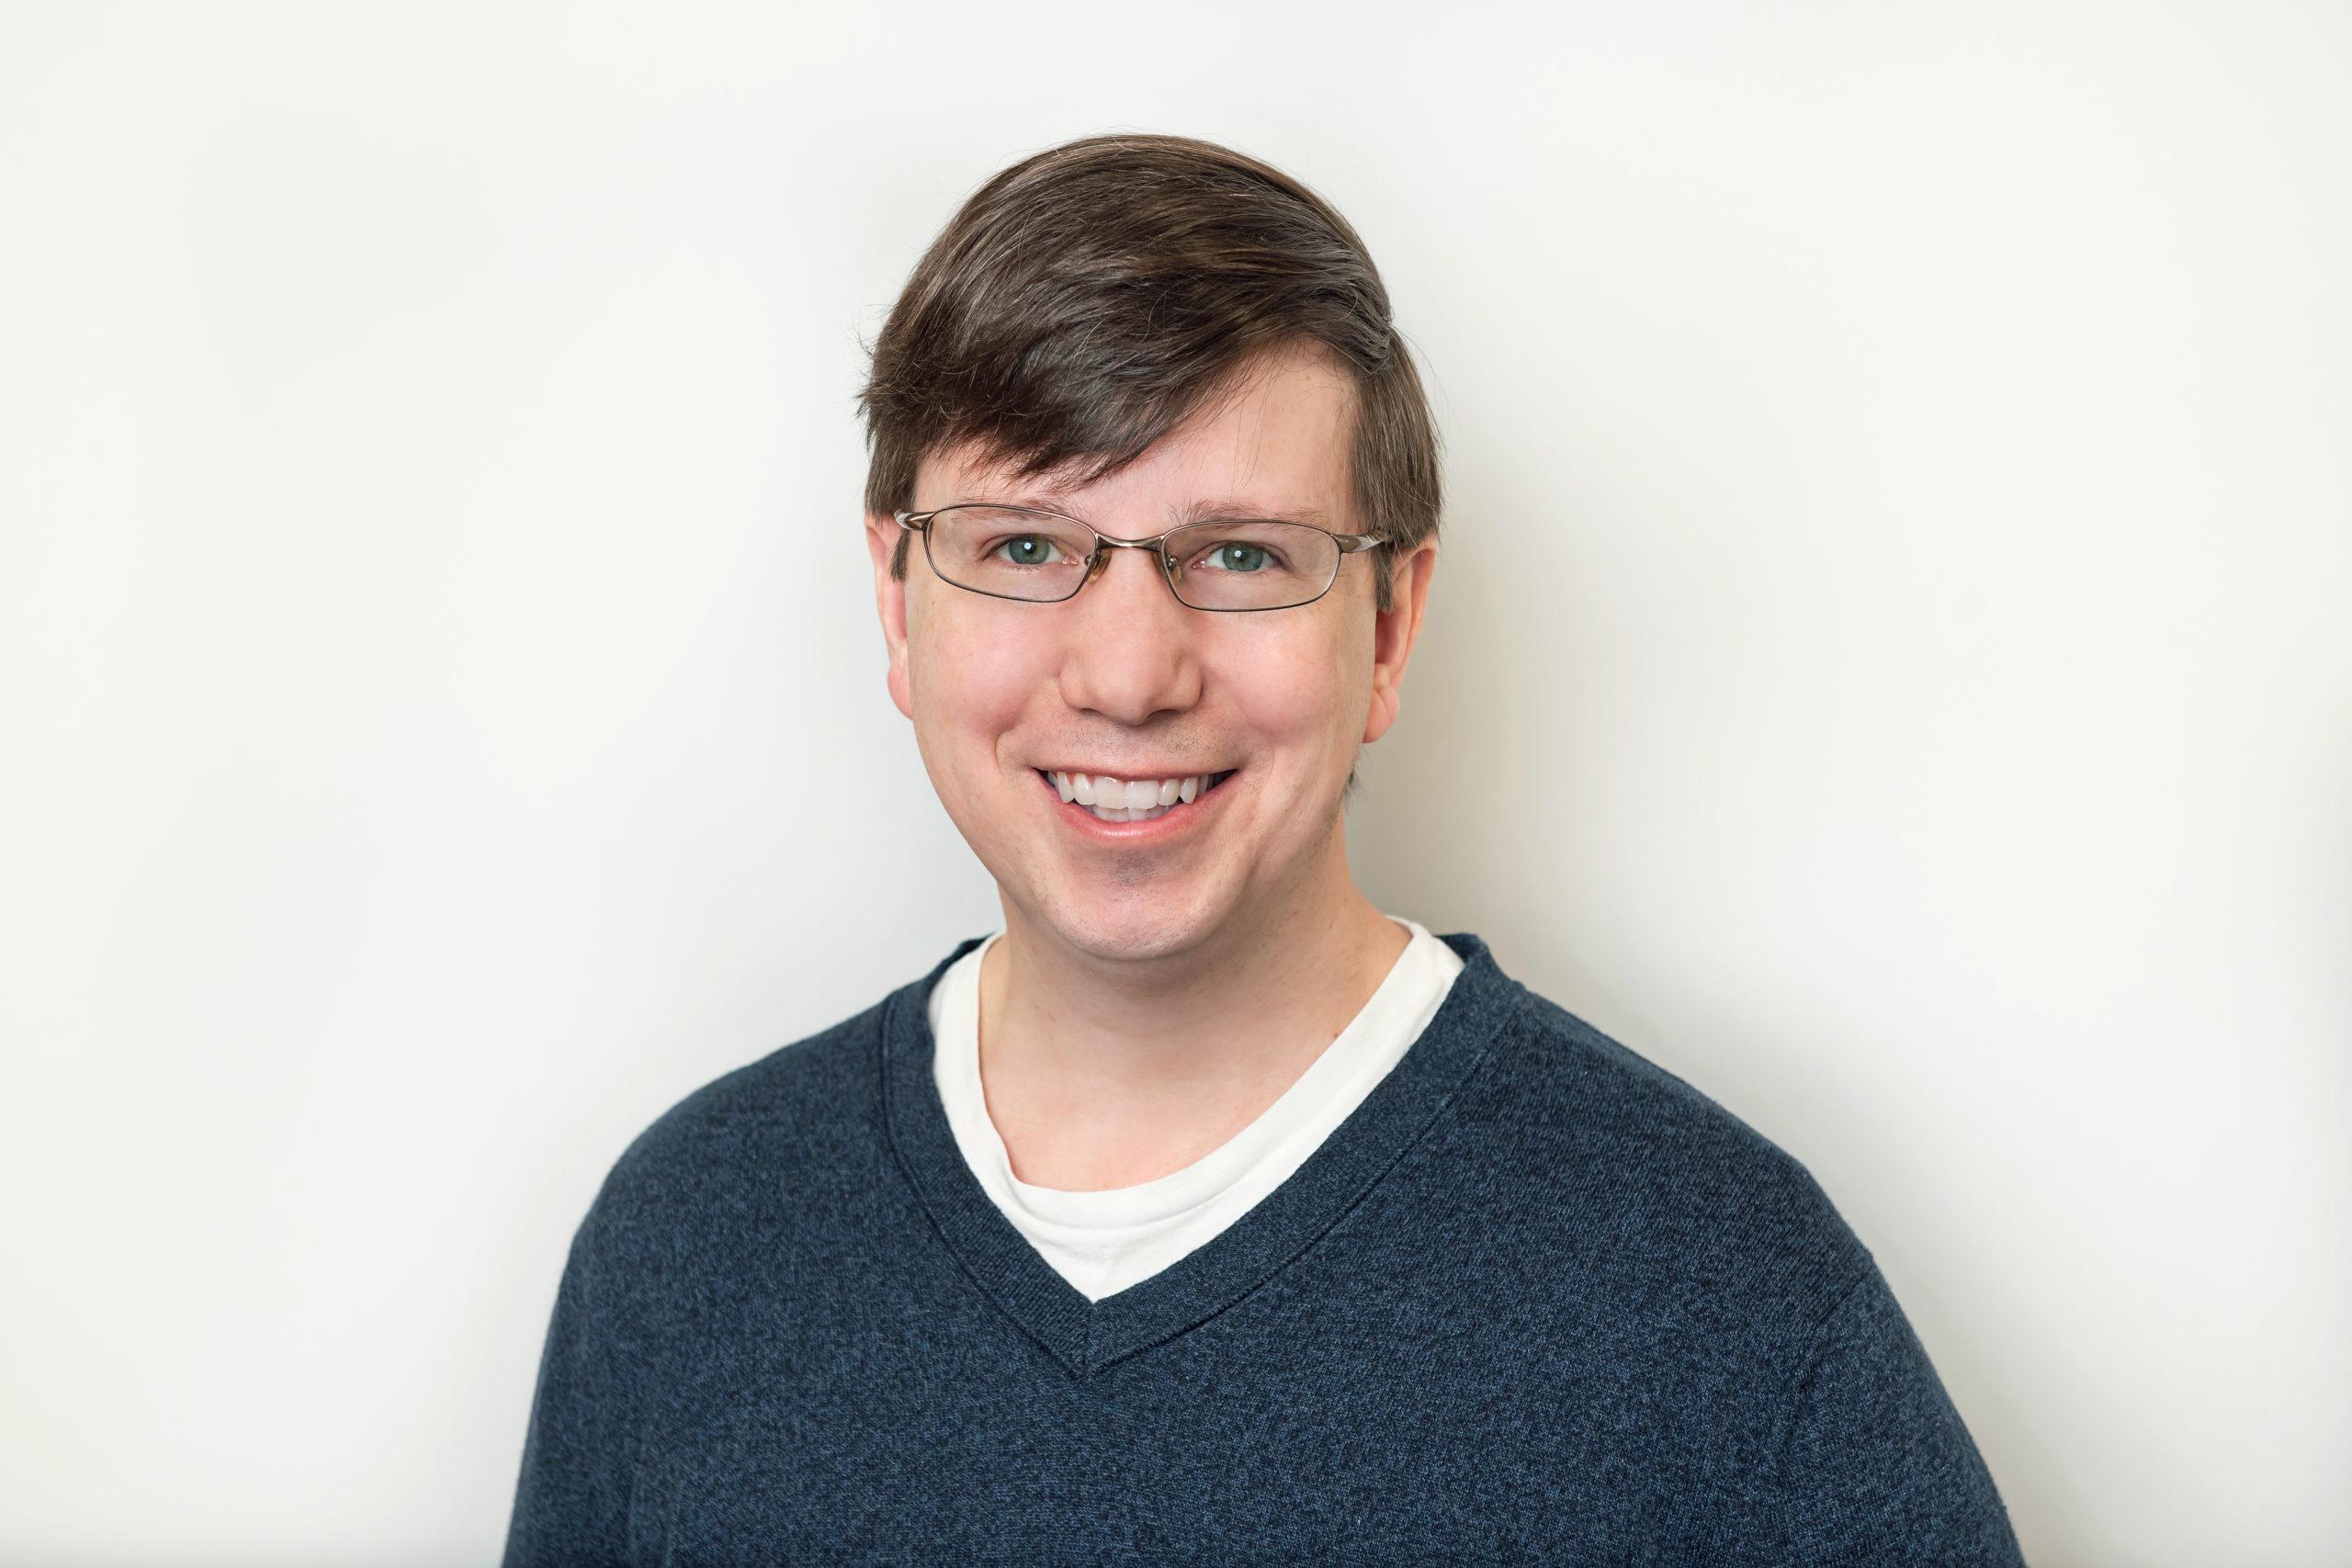 image of Matt LaPalm